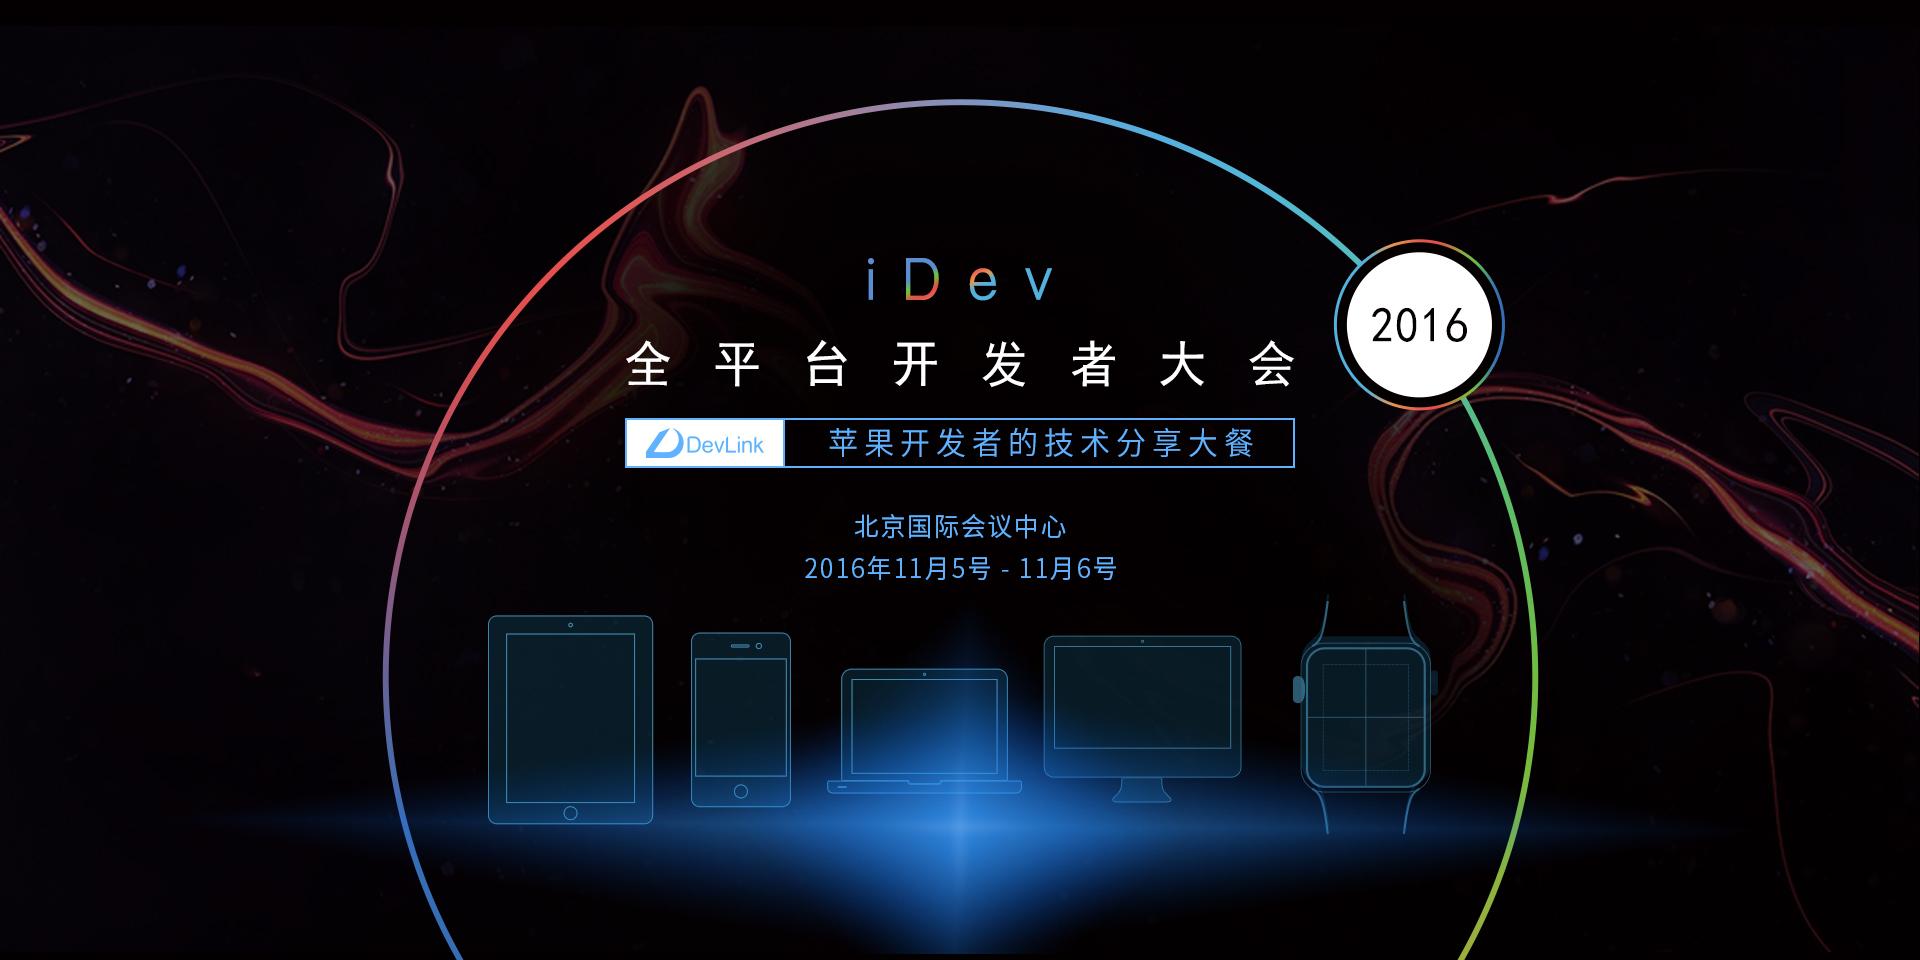 DevLink | iDev 苹果开发者大会 2016